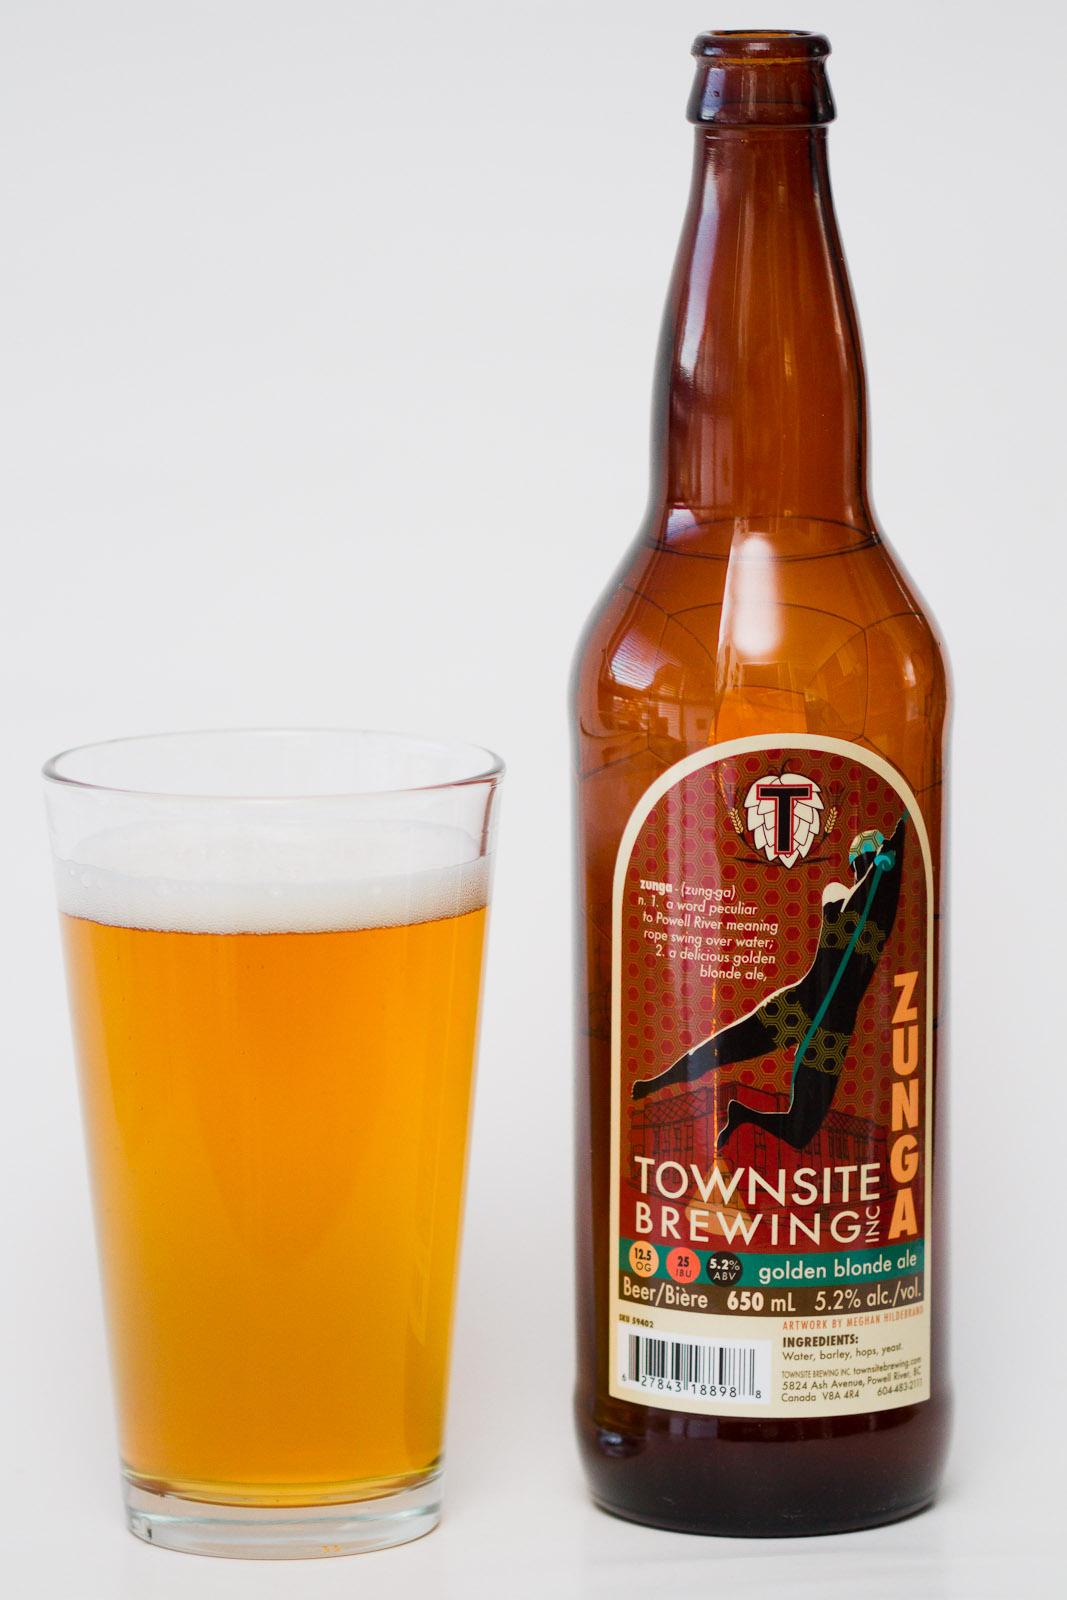 Townsite Brewing Inc Zunga Blonde Ale Beer Me British